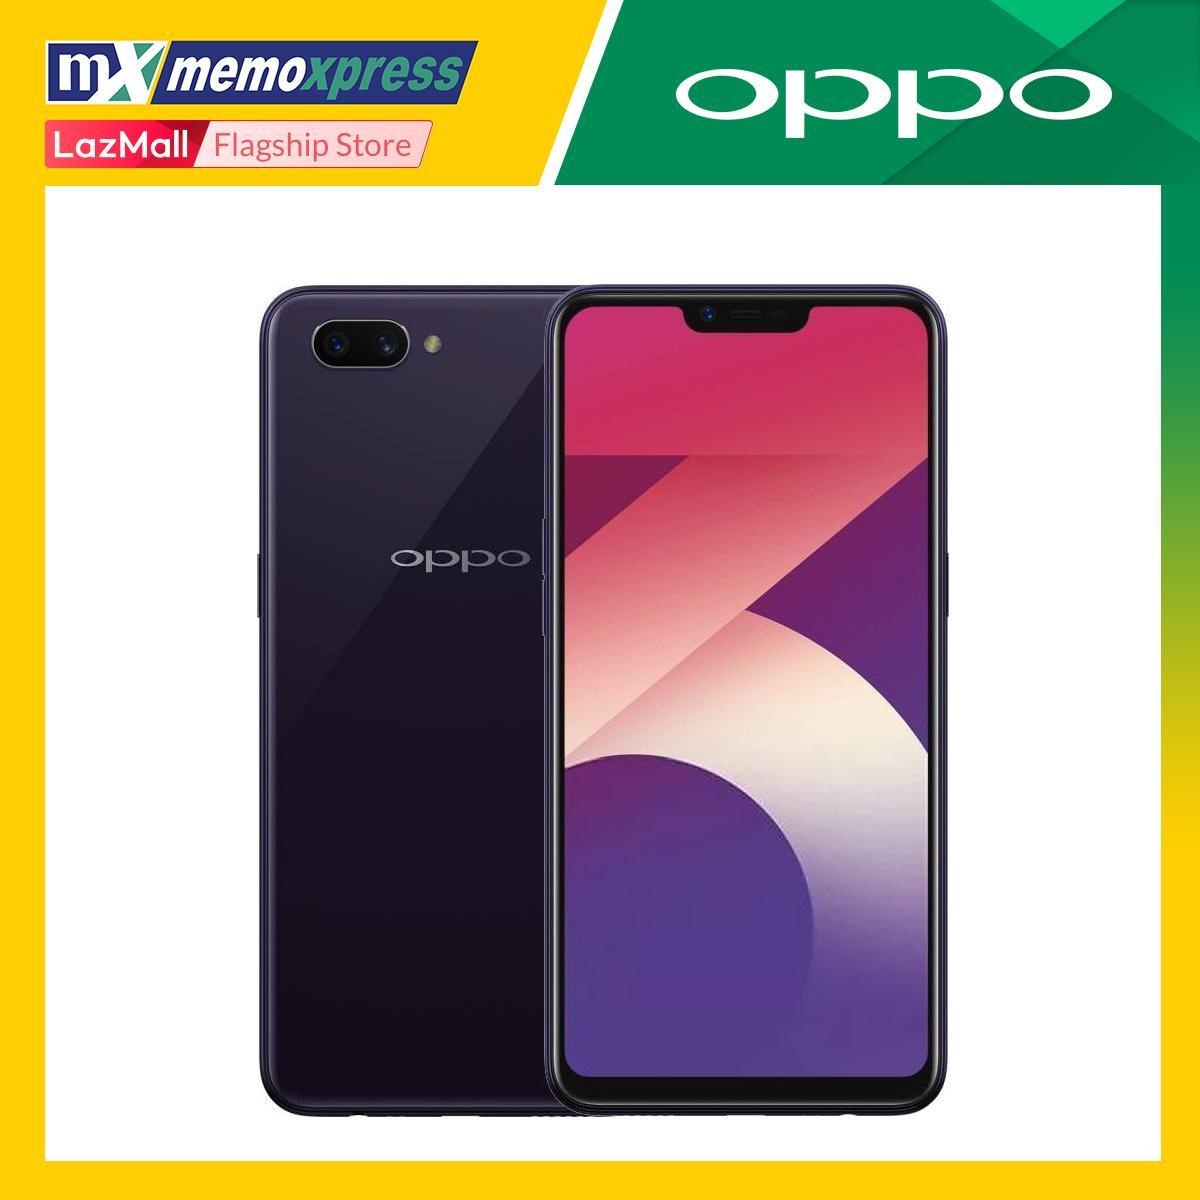 OPPO A3s 16GB - 2GB